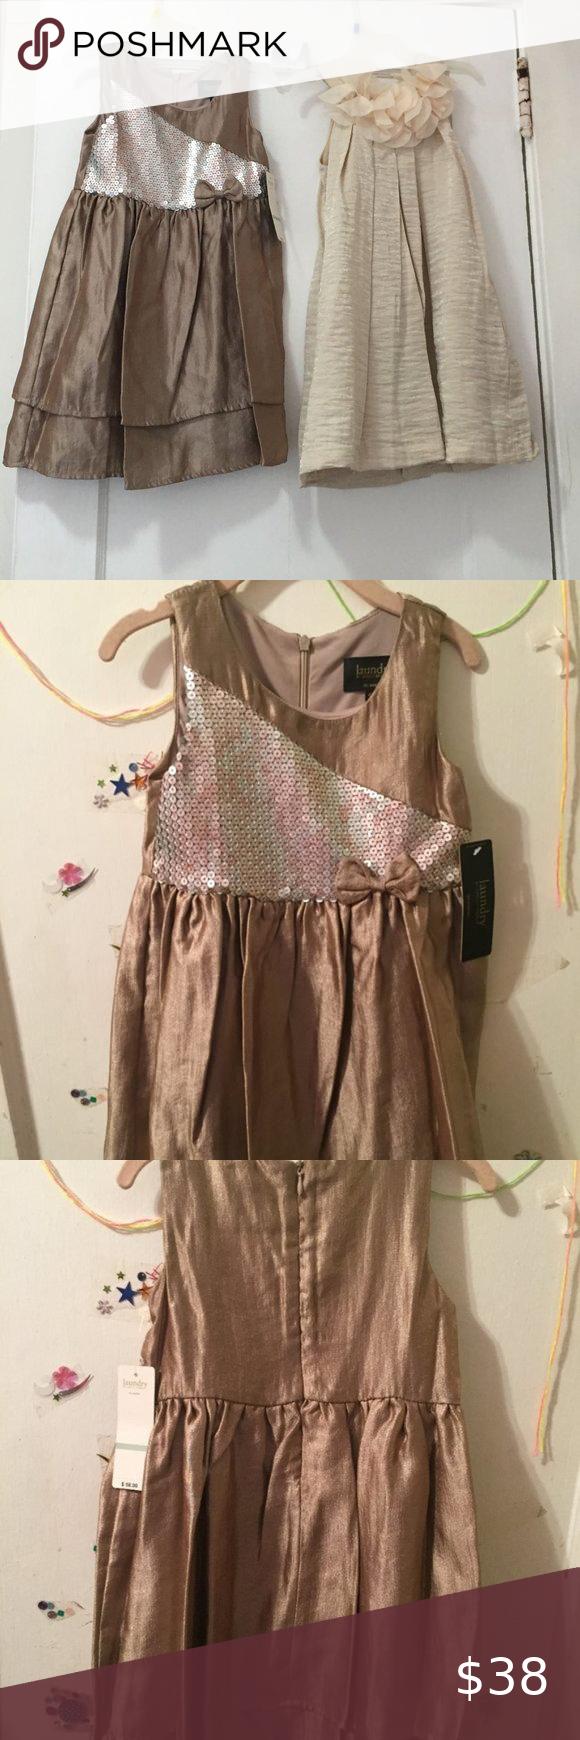 Hp Girl S 2 Pc Party Formal Dress Set Size 4t Set Dress Girls Fancy Dress Toddler Flower Girl Dresses [ 1740 x 580 Pixel ]